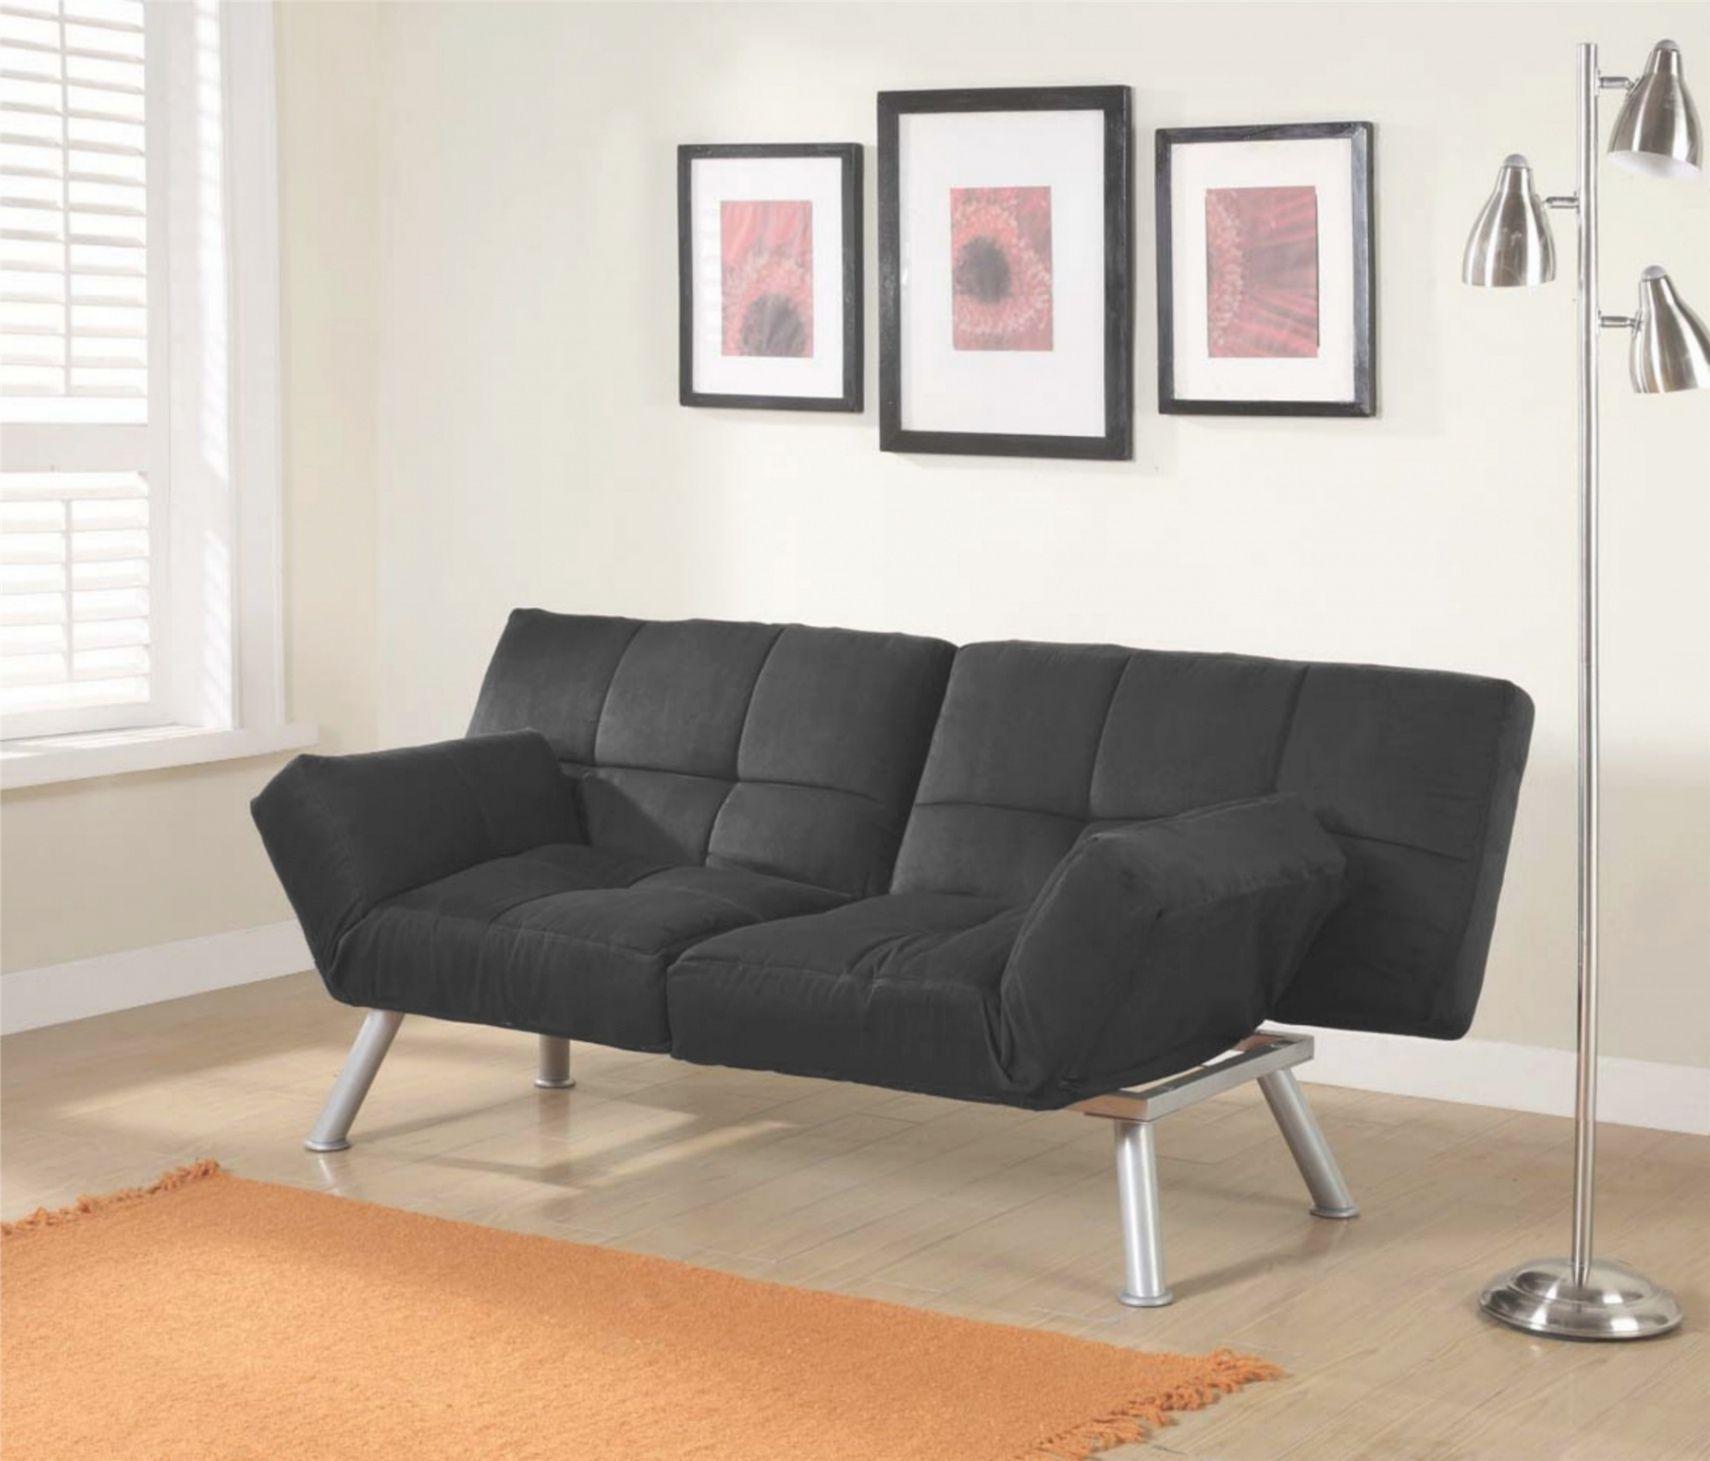 cheap futons for sale free shipping cheap futons for sale free shipping   sleeping furniture ideas      rh   pinterest